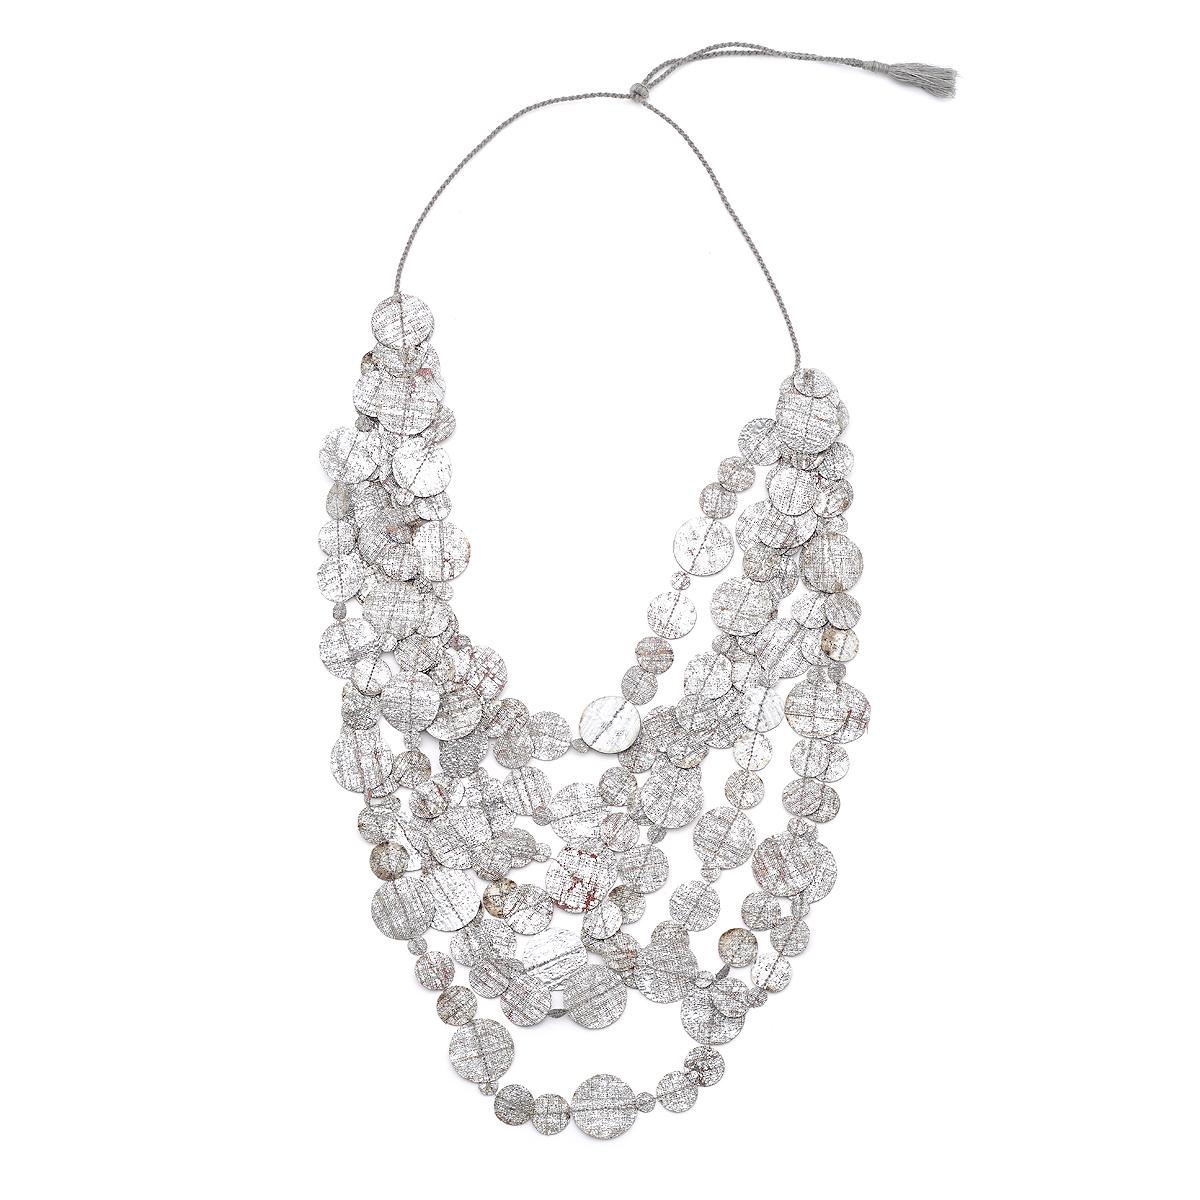 Geometric silver circles fabric necklace by Yavi